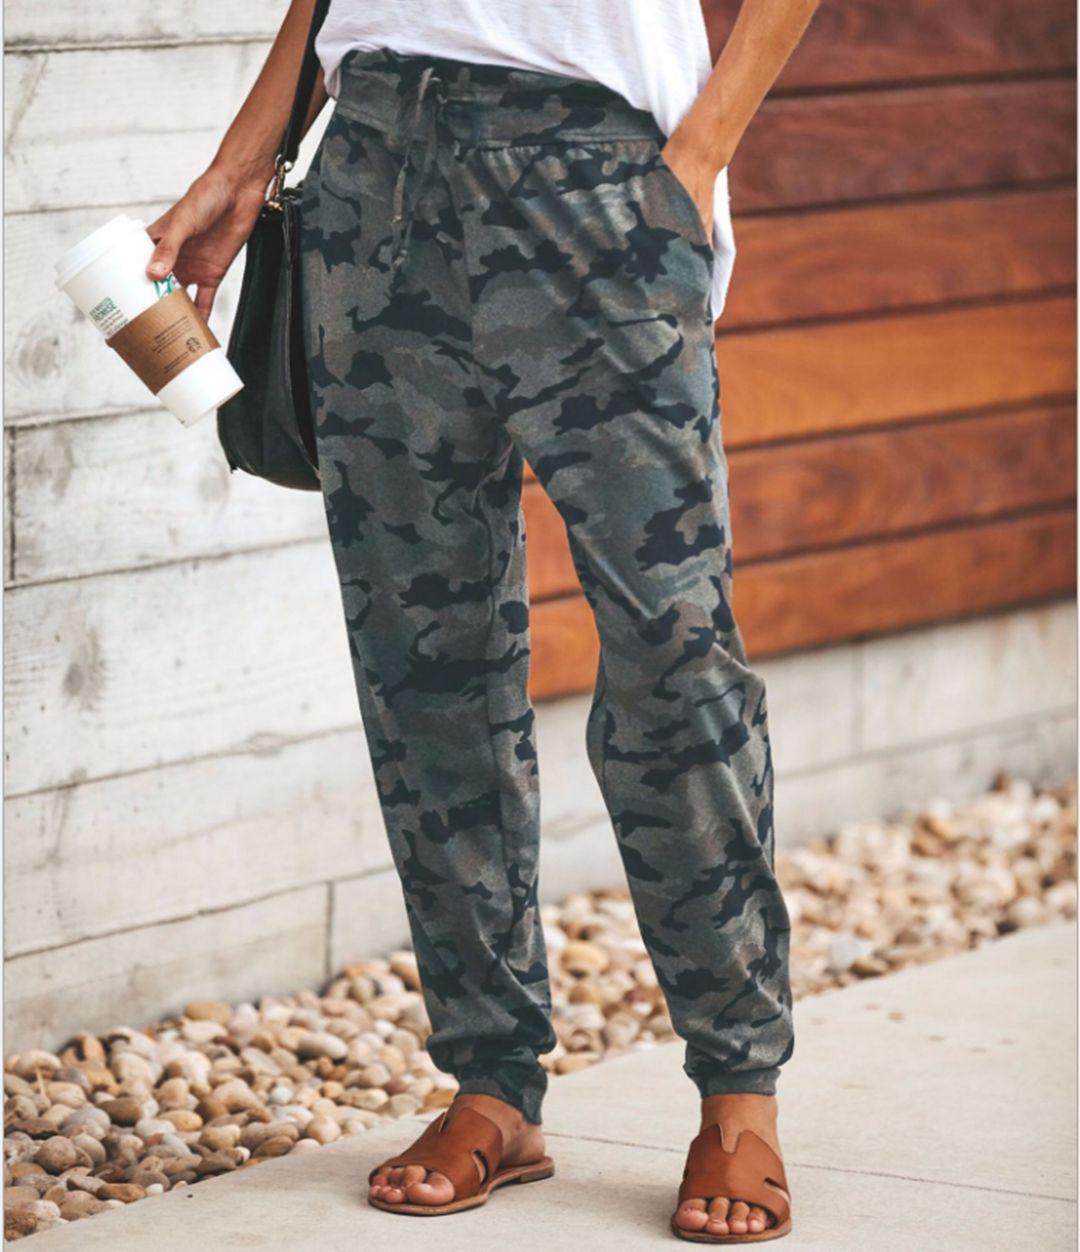 New Women Camo Cargo High Waist Hip Hop Trousers   Pants   Military Army Combat Camouflage Long   Pants   Hot   Capris   Plus Size 3XL 4XL